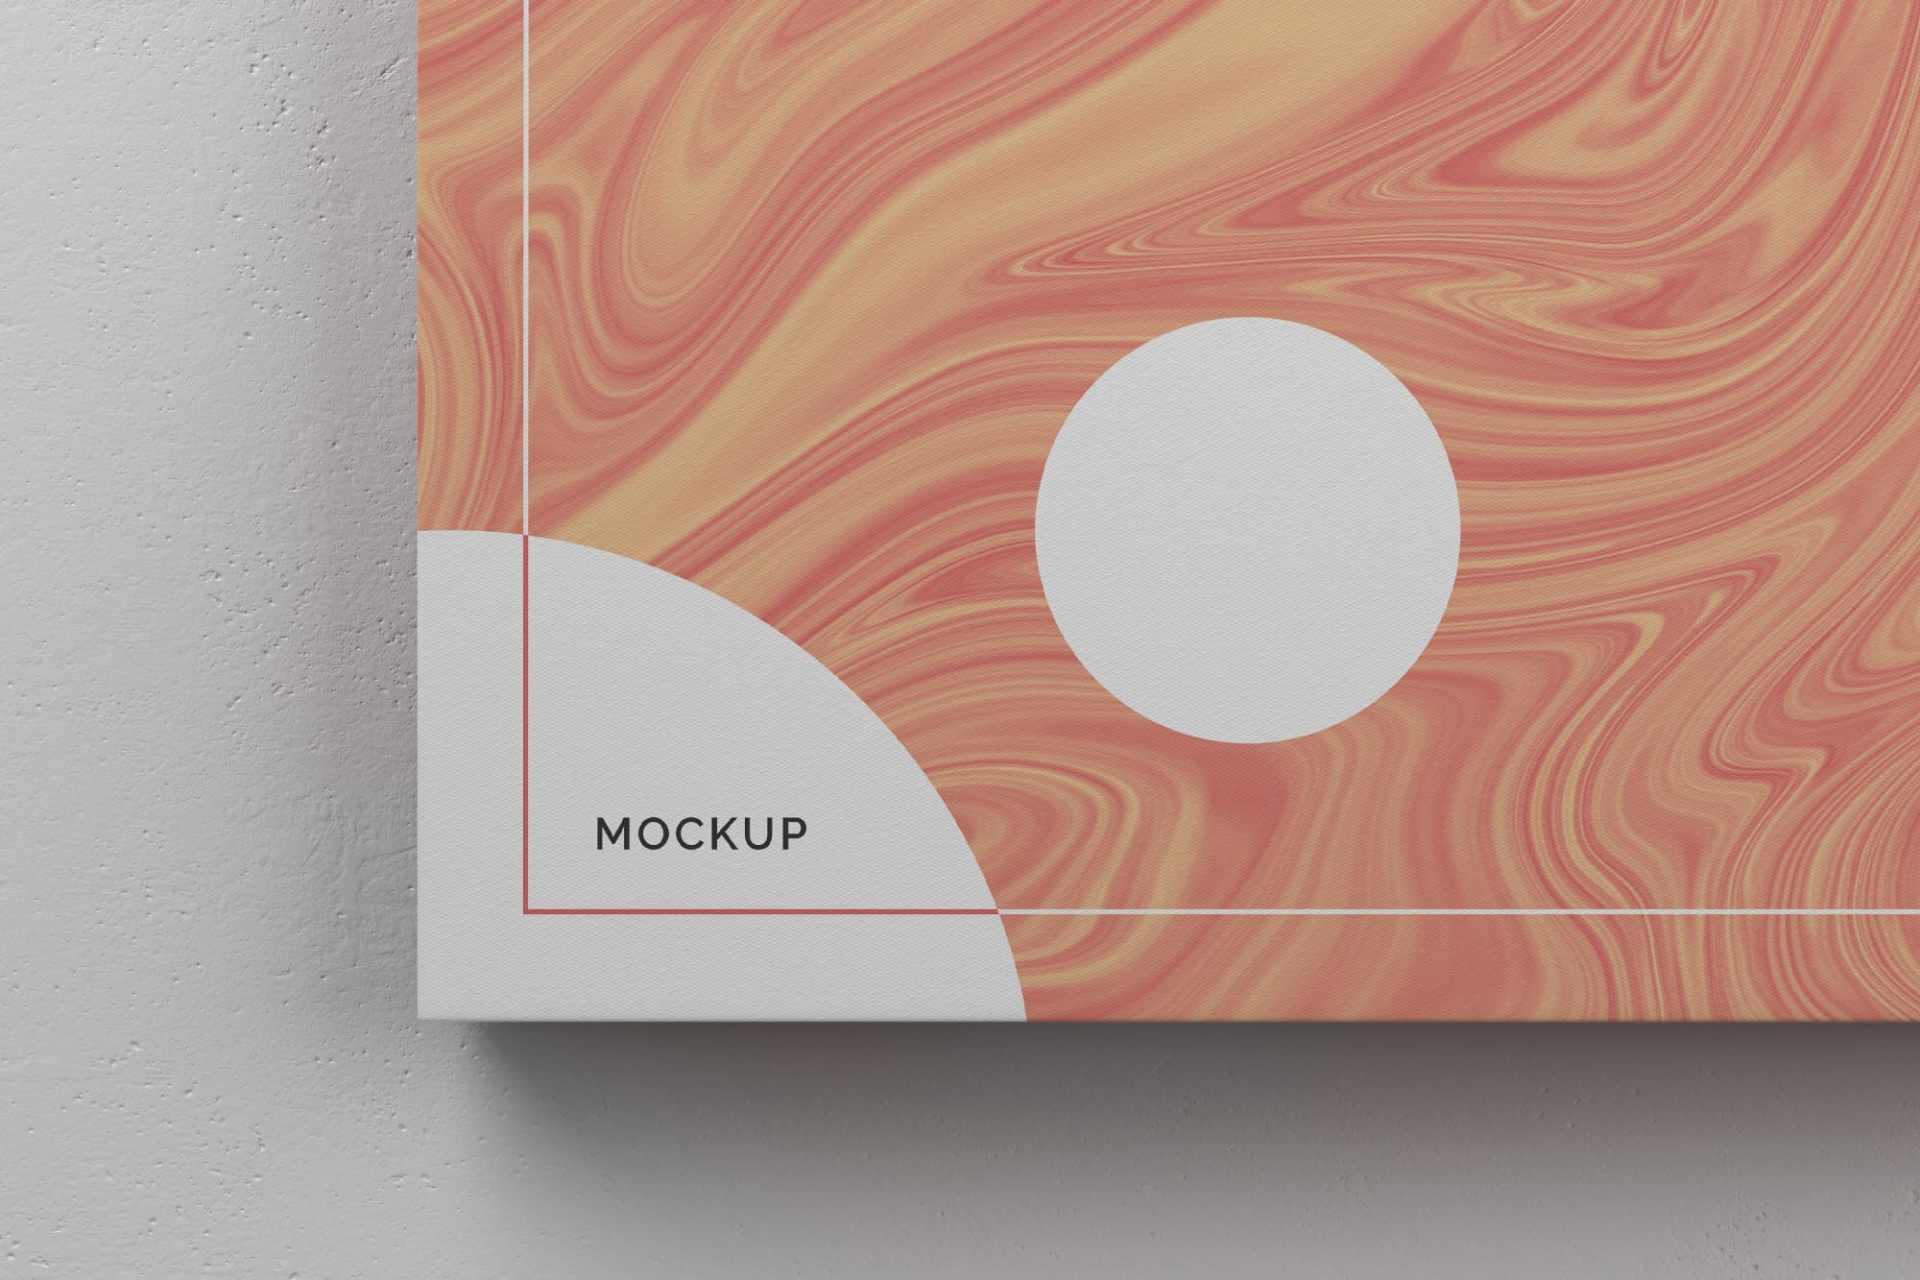 Landscape Canvas Ratio 5:4 Mockup for Photoshop